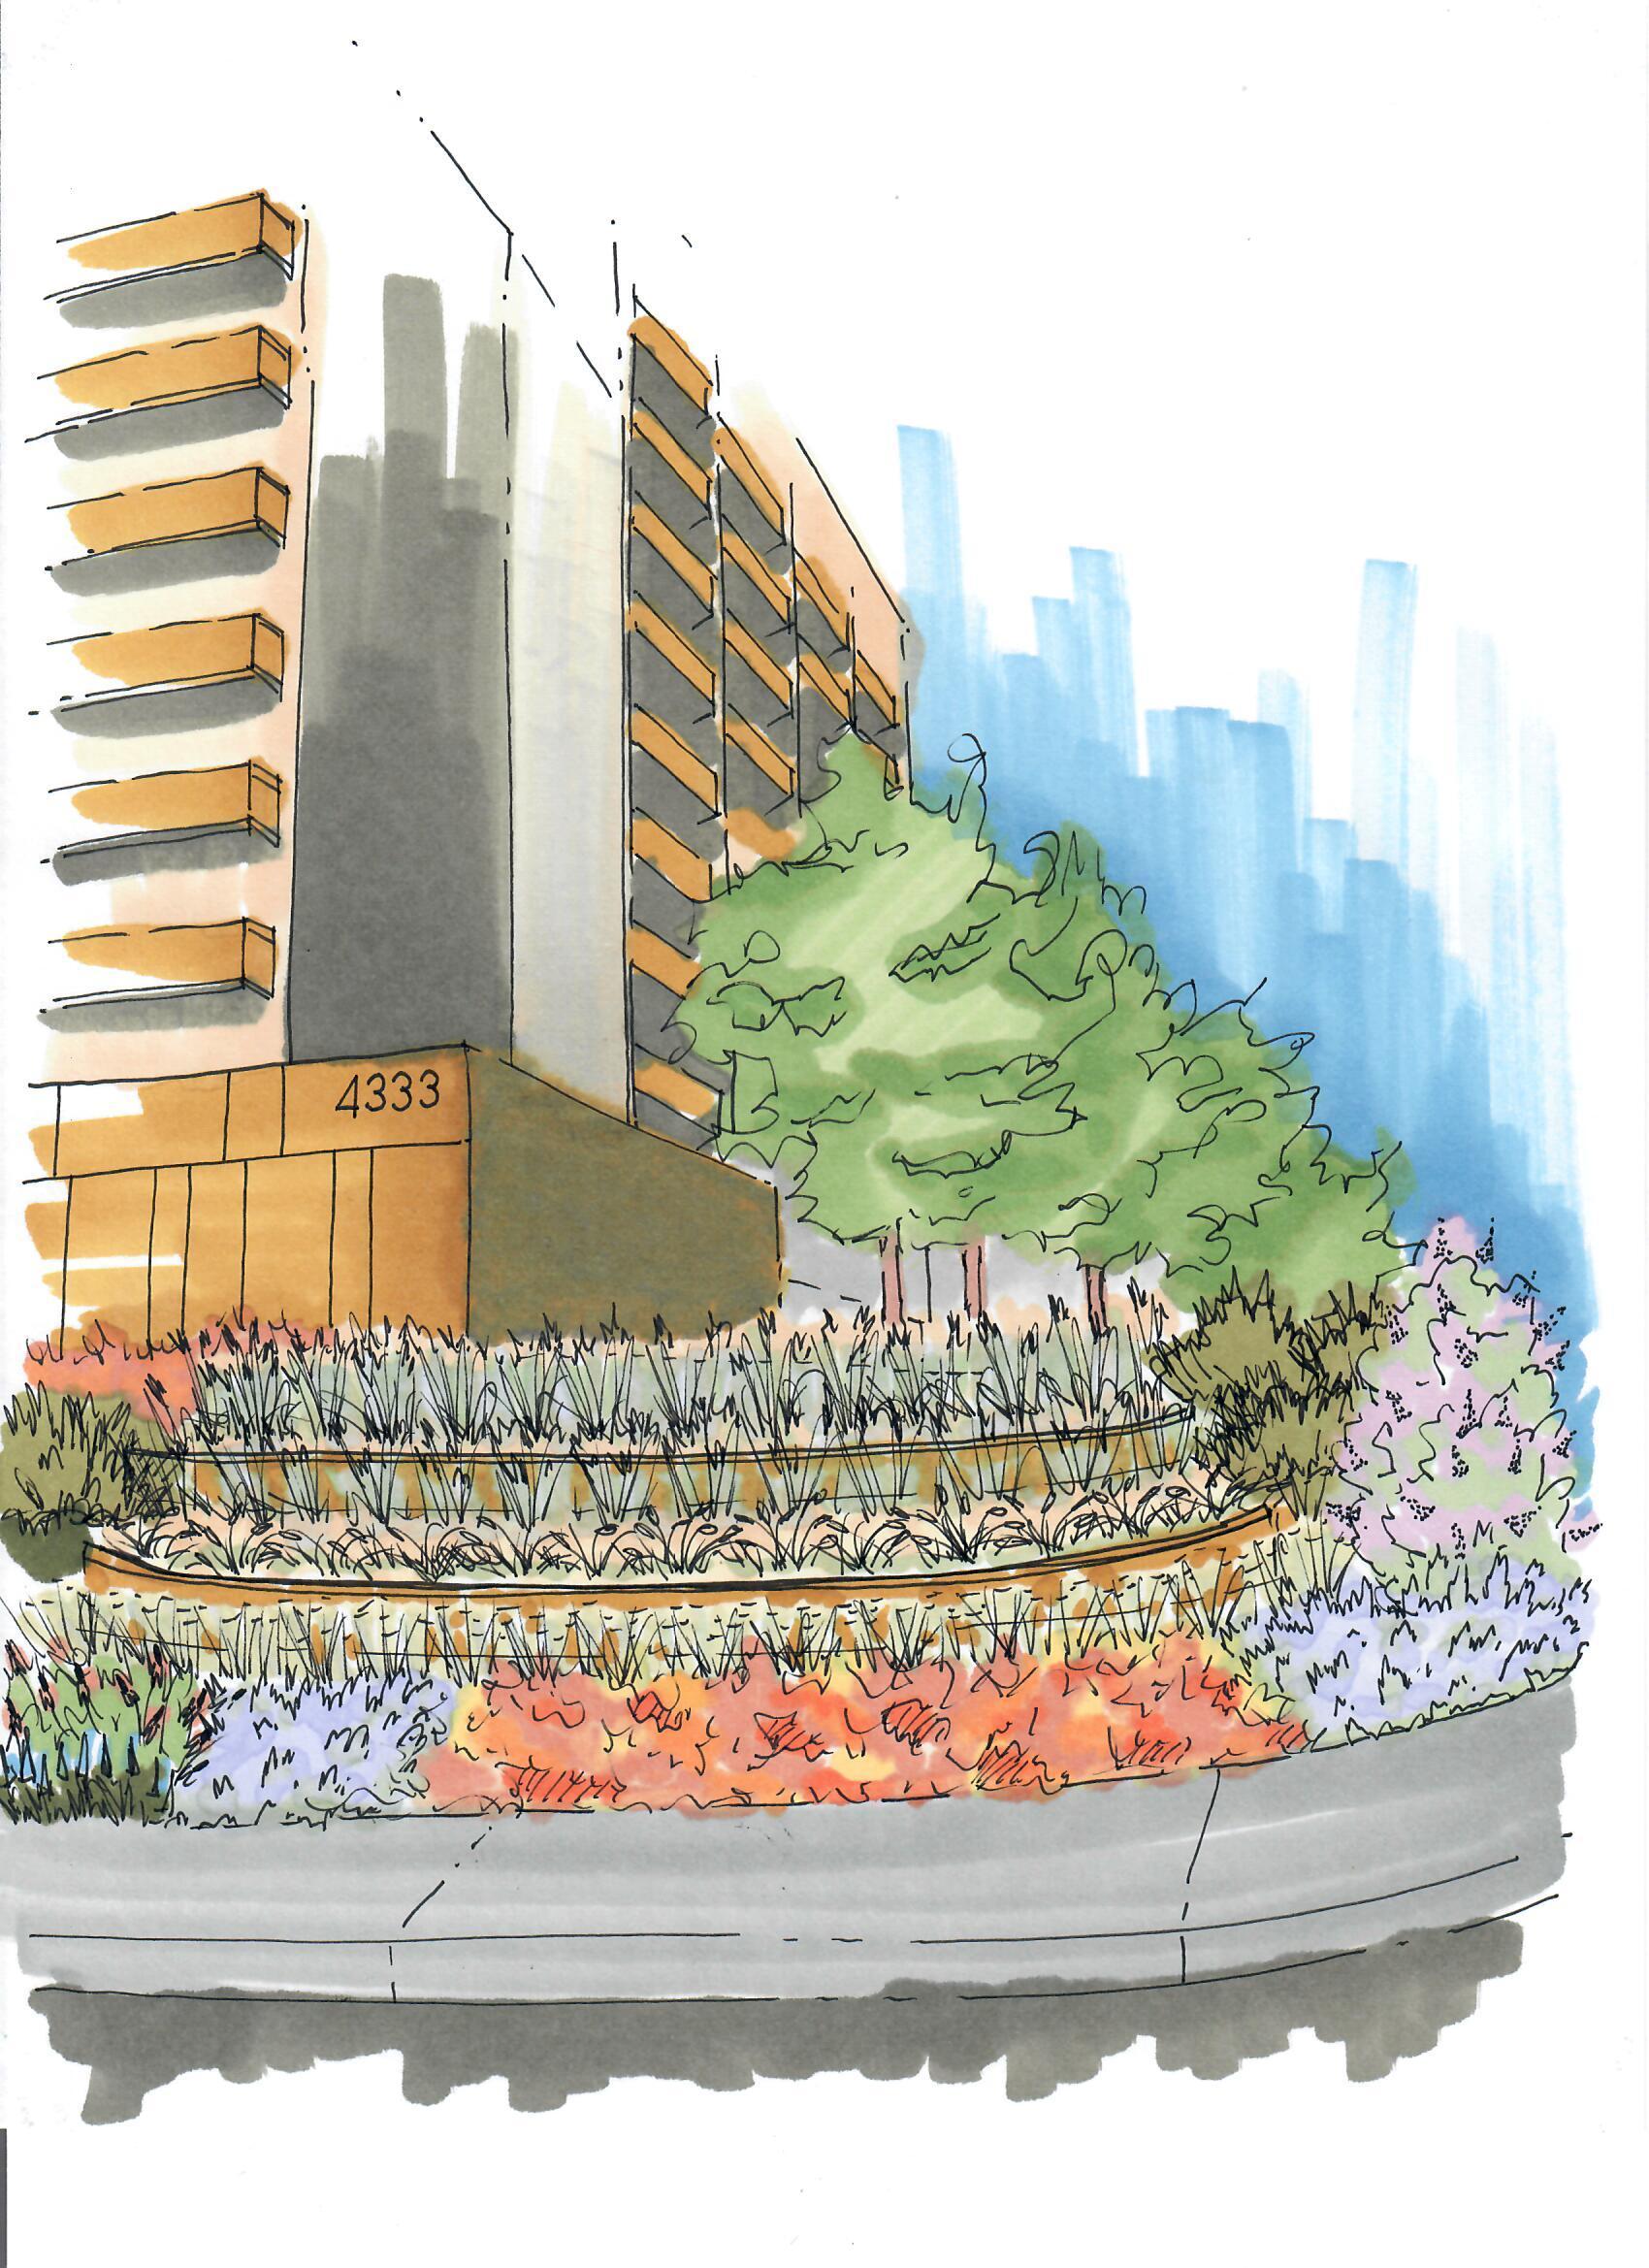 dha-syracuse-perspective-sketch